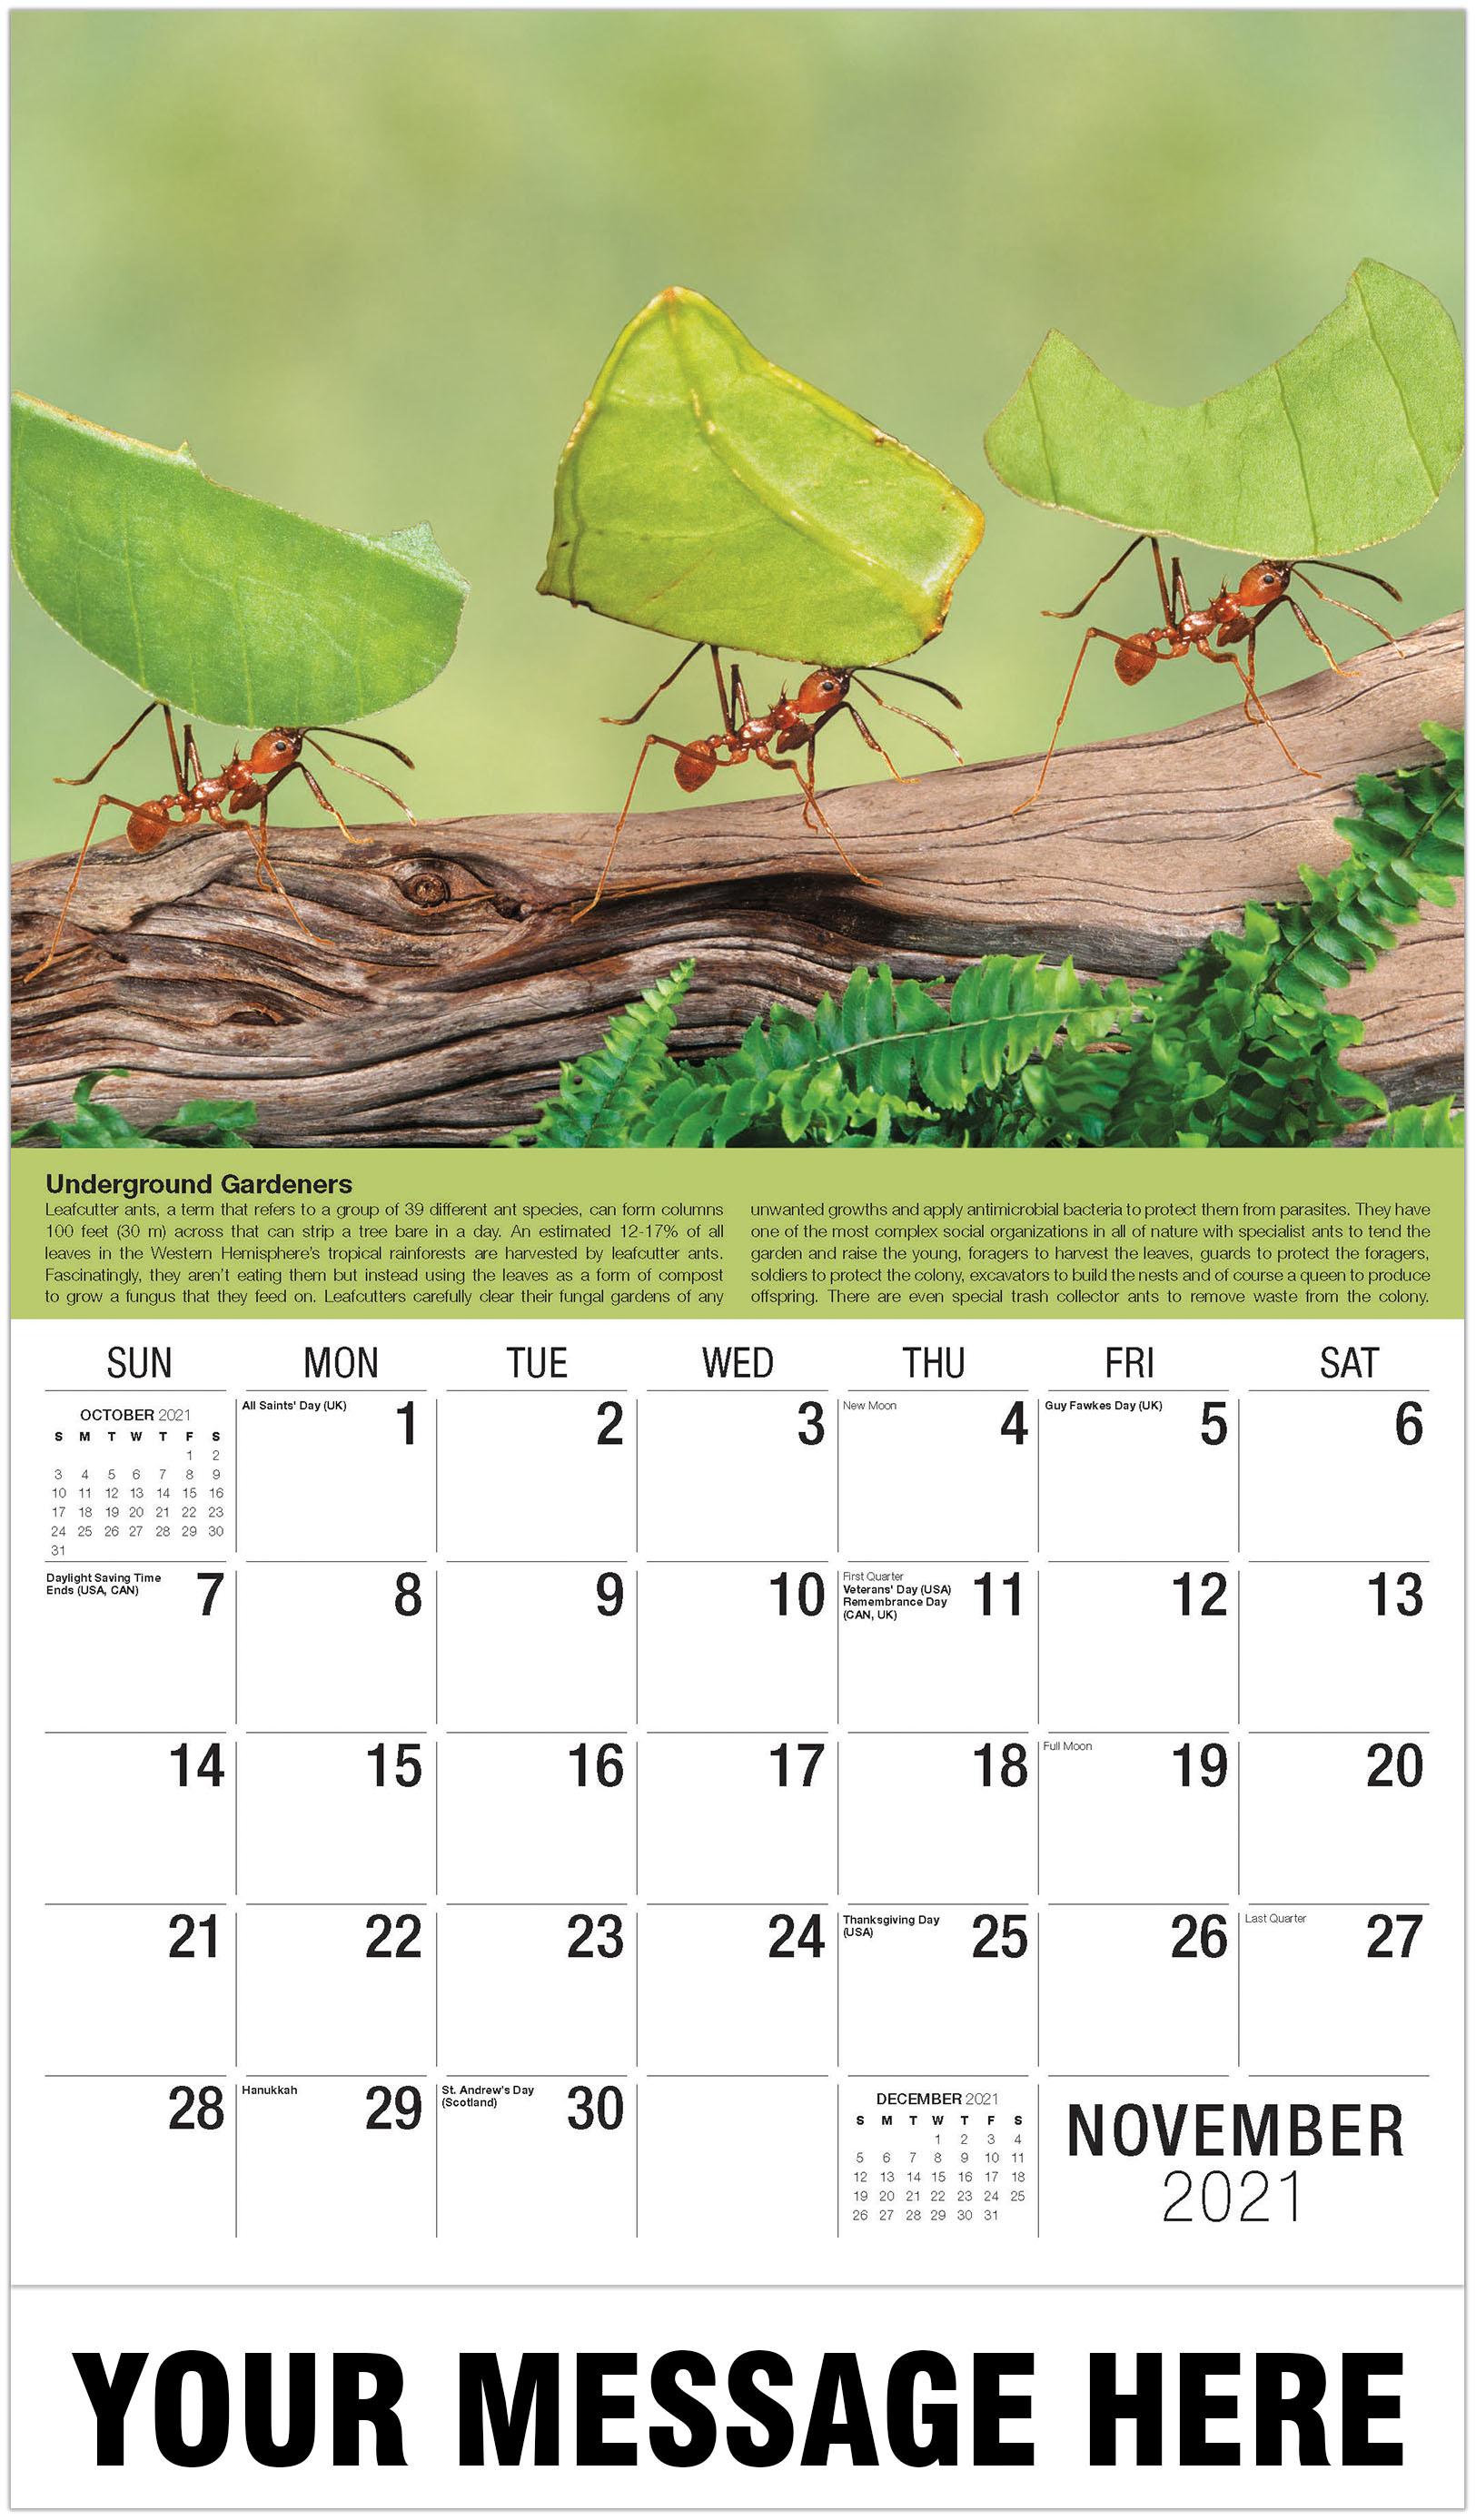 2021 Planet Earth Advertising Calendar | Business ...